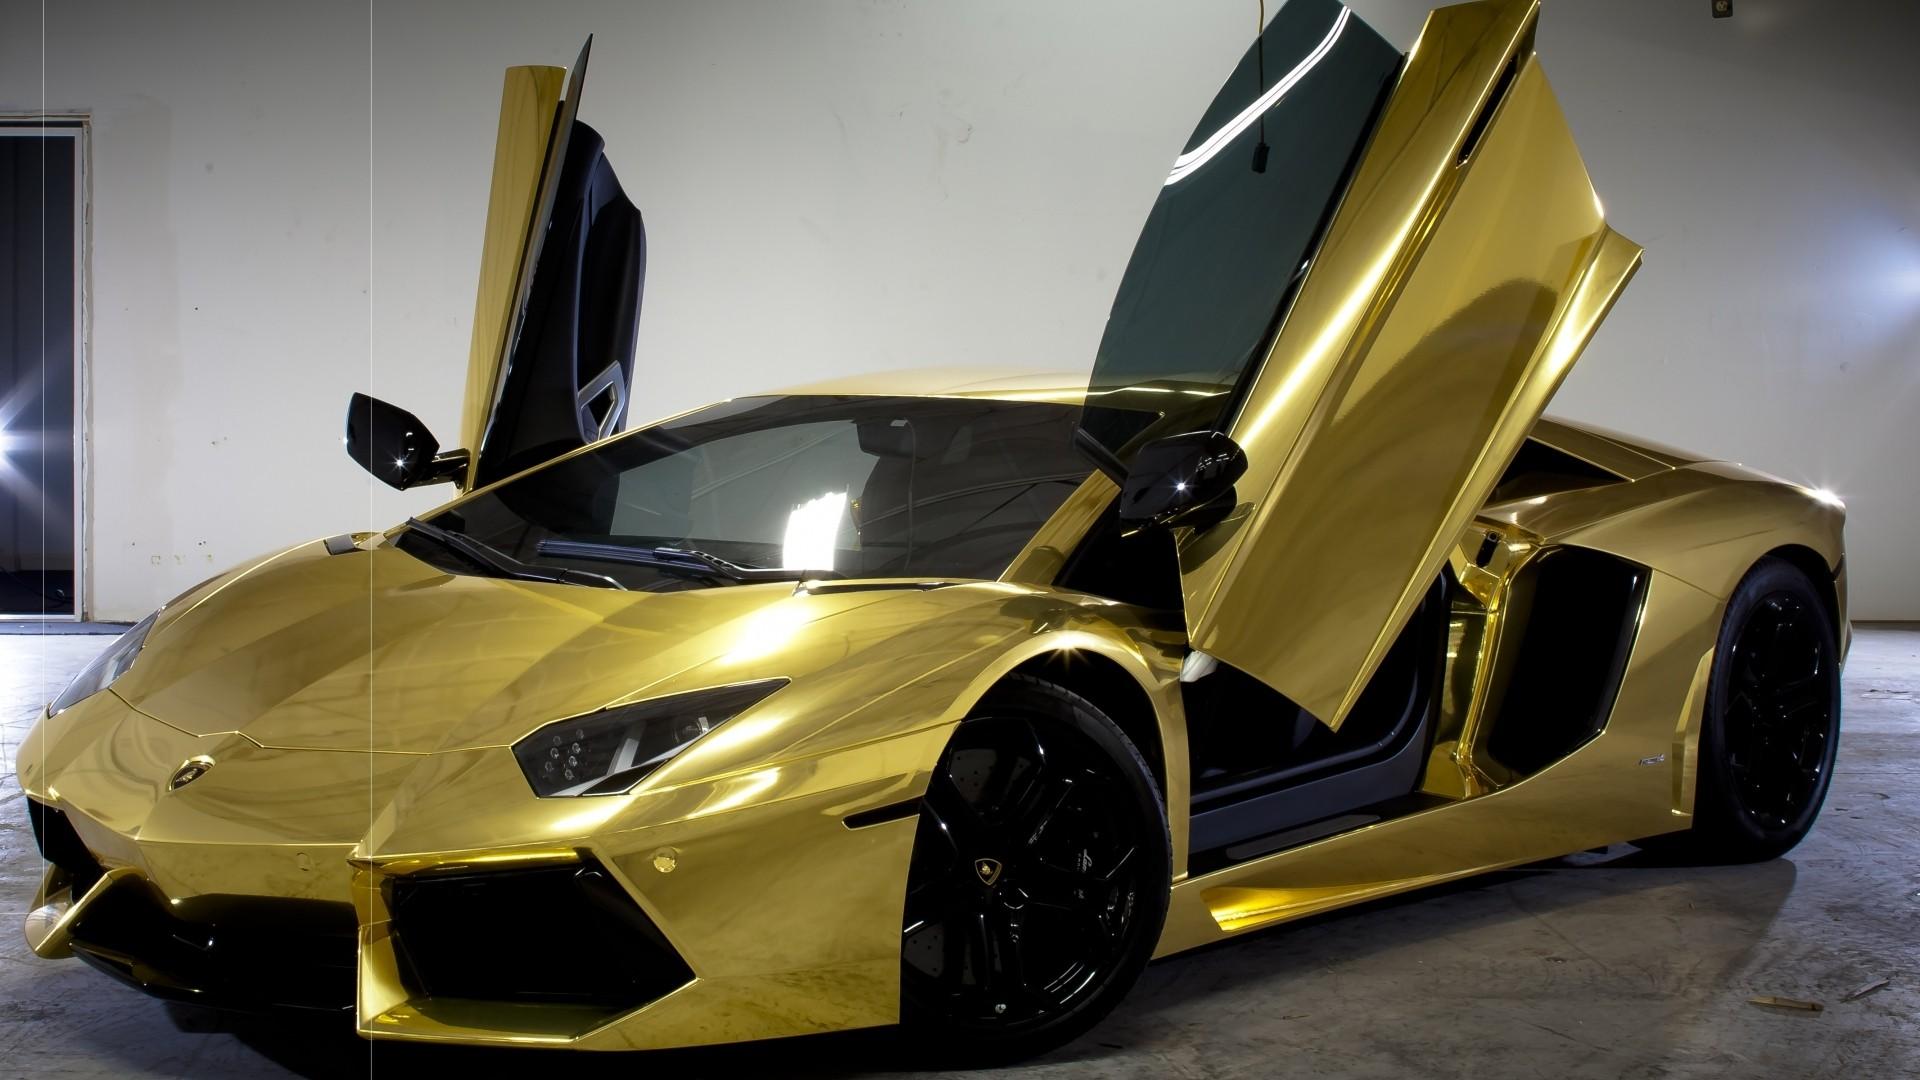 Gold Lamborghini Wallpaper and Background